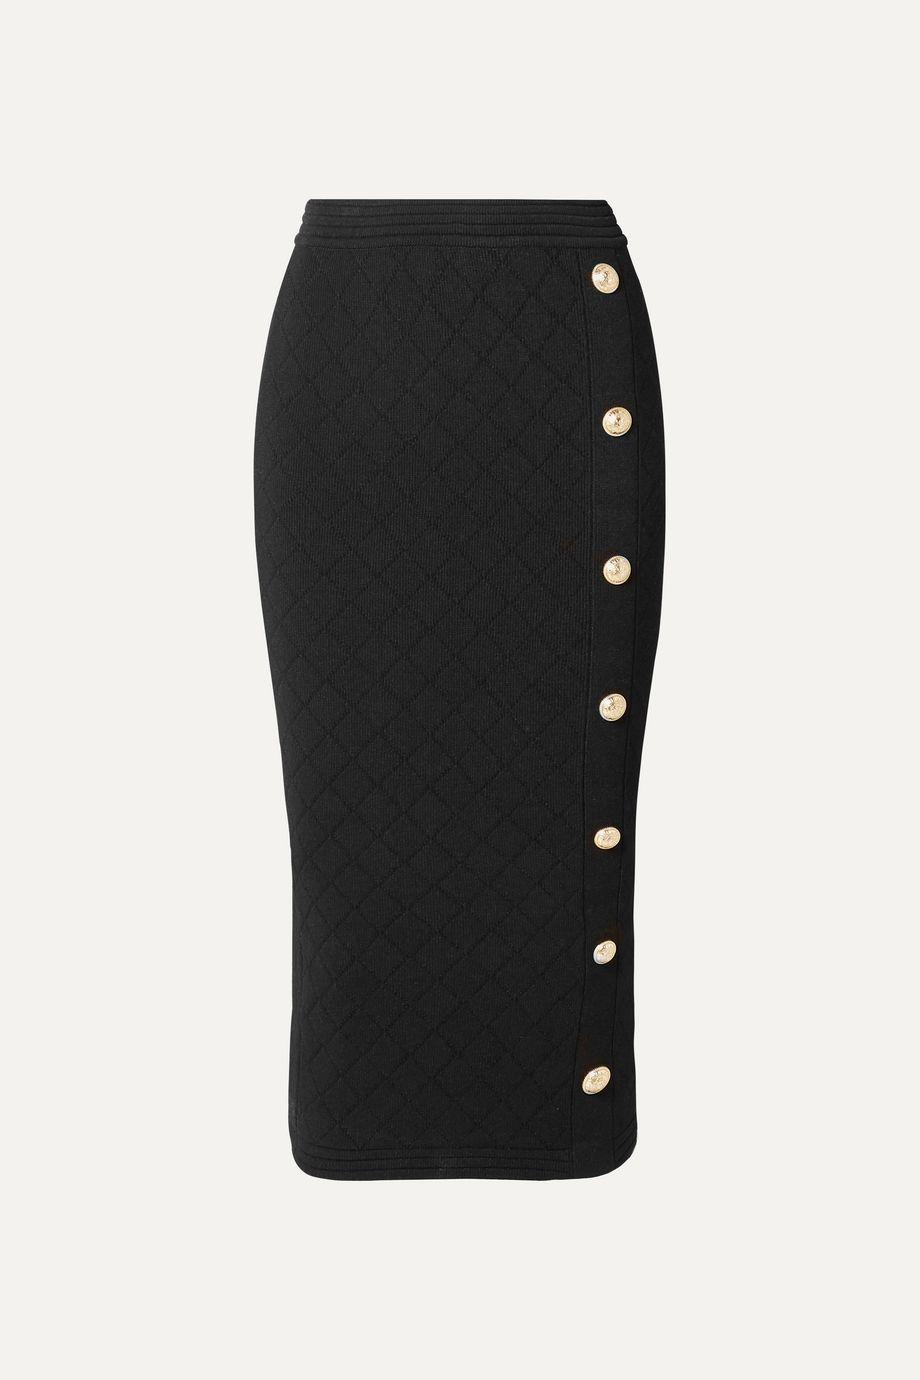 Balmain Button-embellished jacquard-knit midi skirt